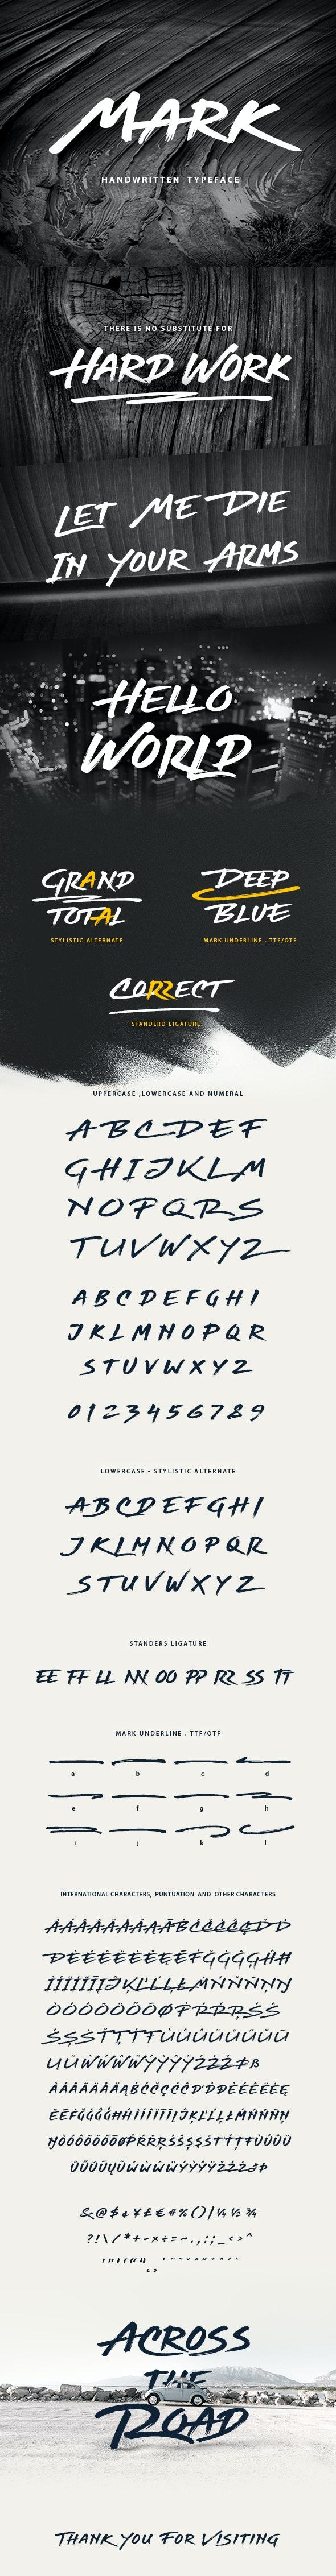 Mark Handwritten Graffiti Font - Handwriting Fonts